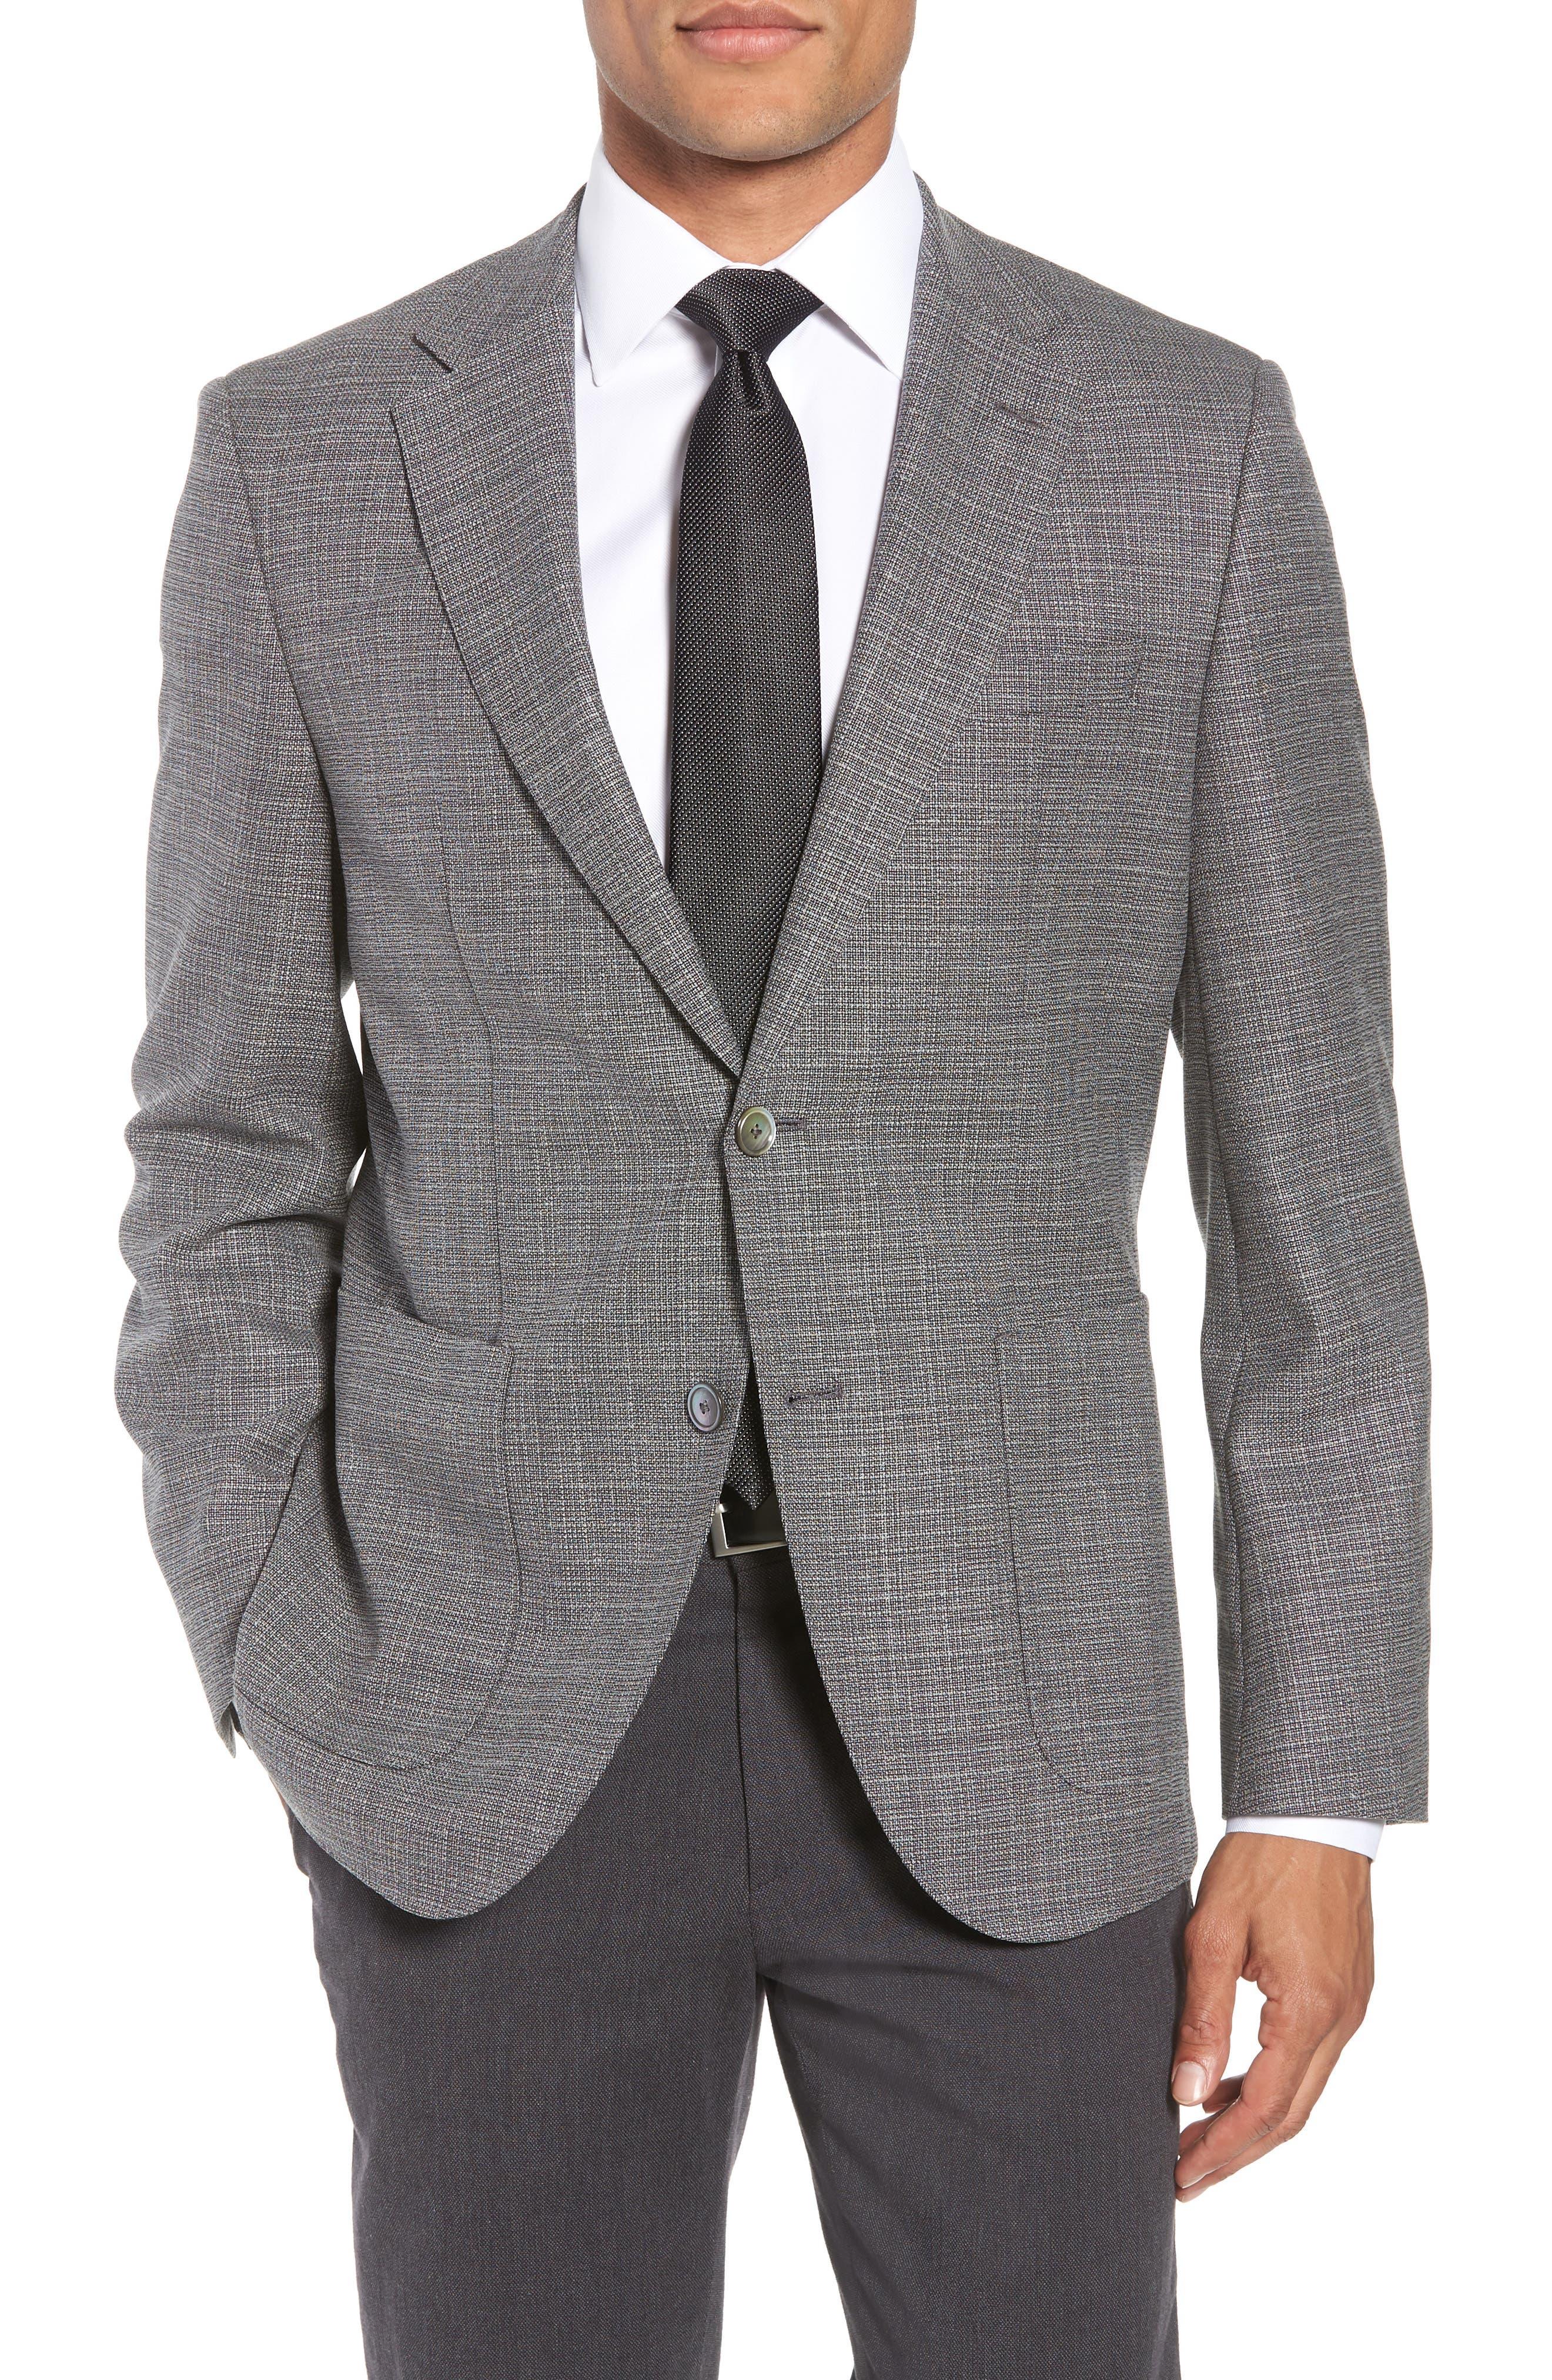 Janson Classic Fit Wool Blazer,                             Main thumbnail 1, color,                             GREY